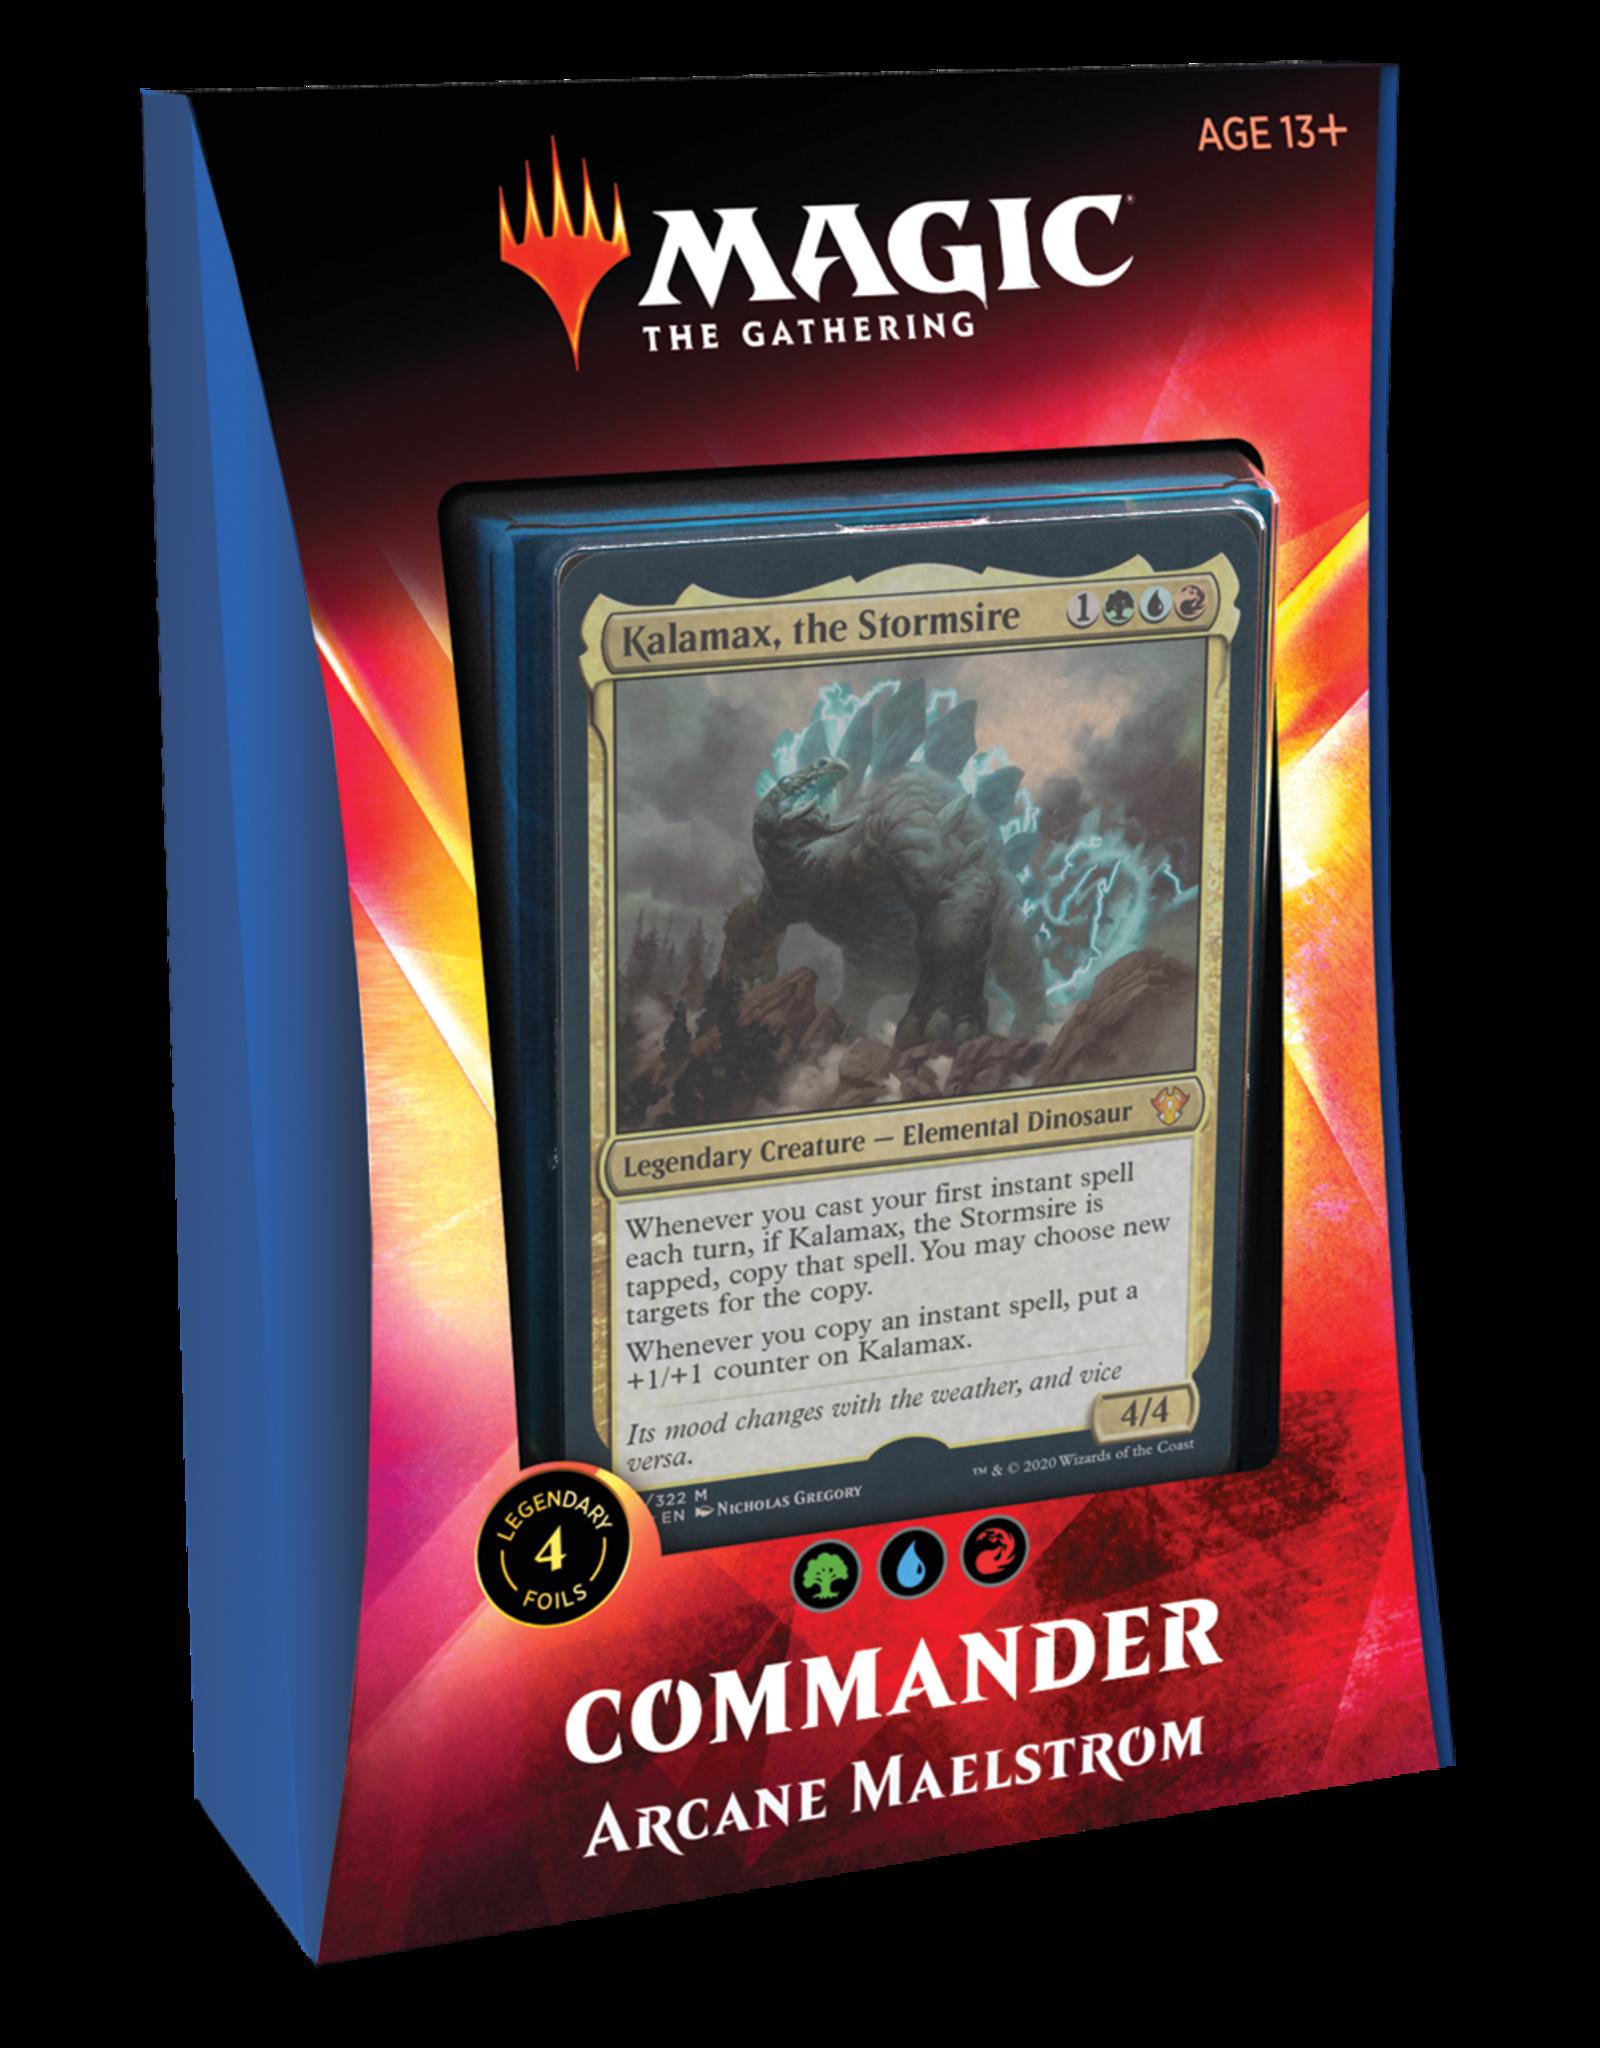 Wizards of the Coast MTG IKORIA COMMANDER 2020 - Arcane Maelstrom